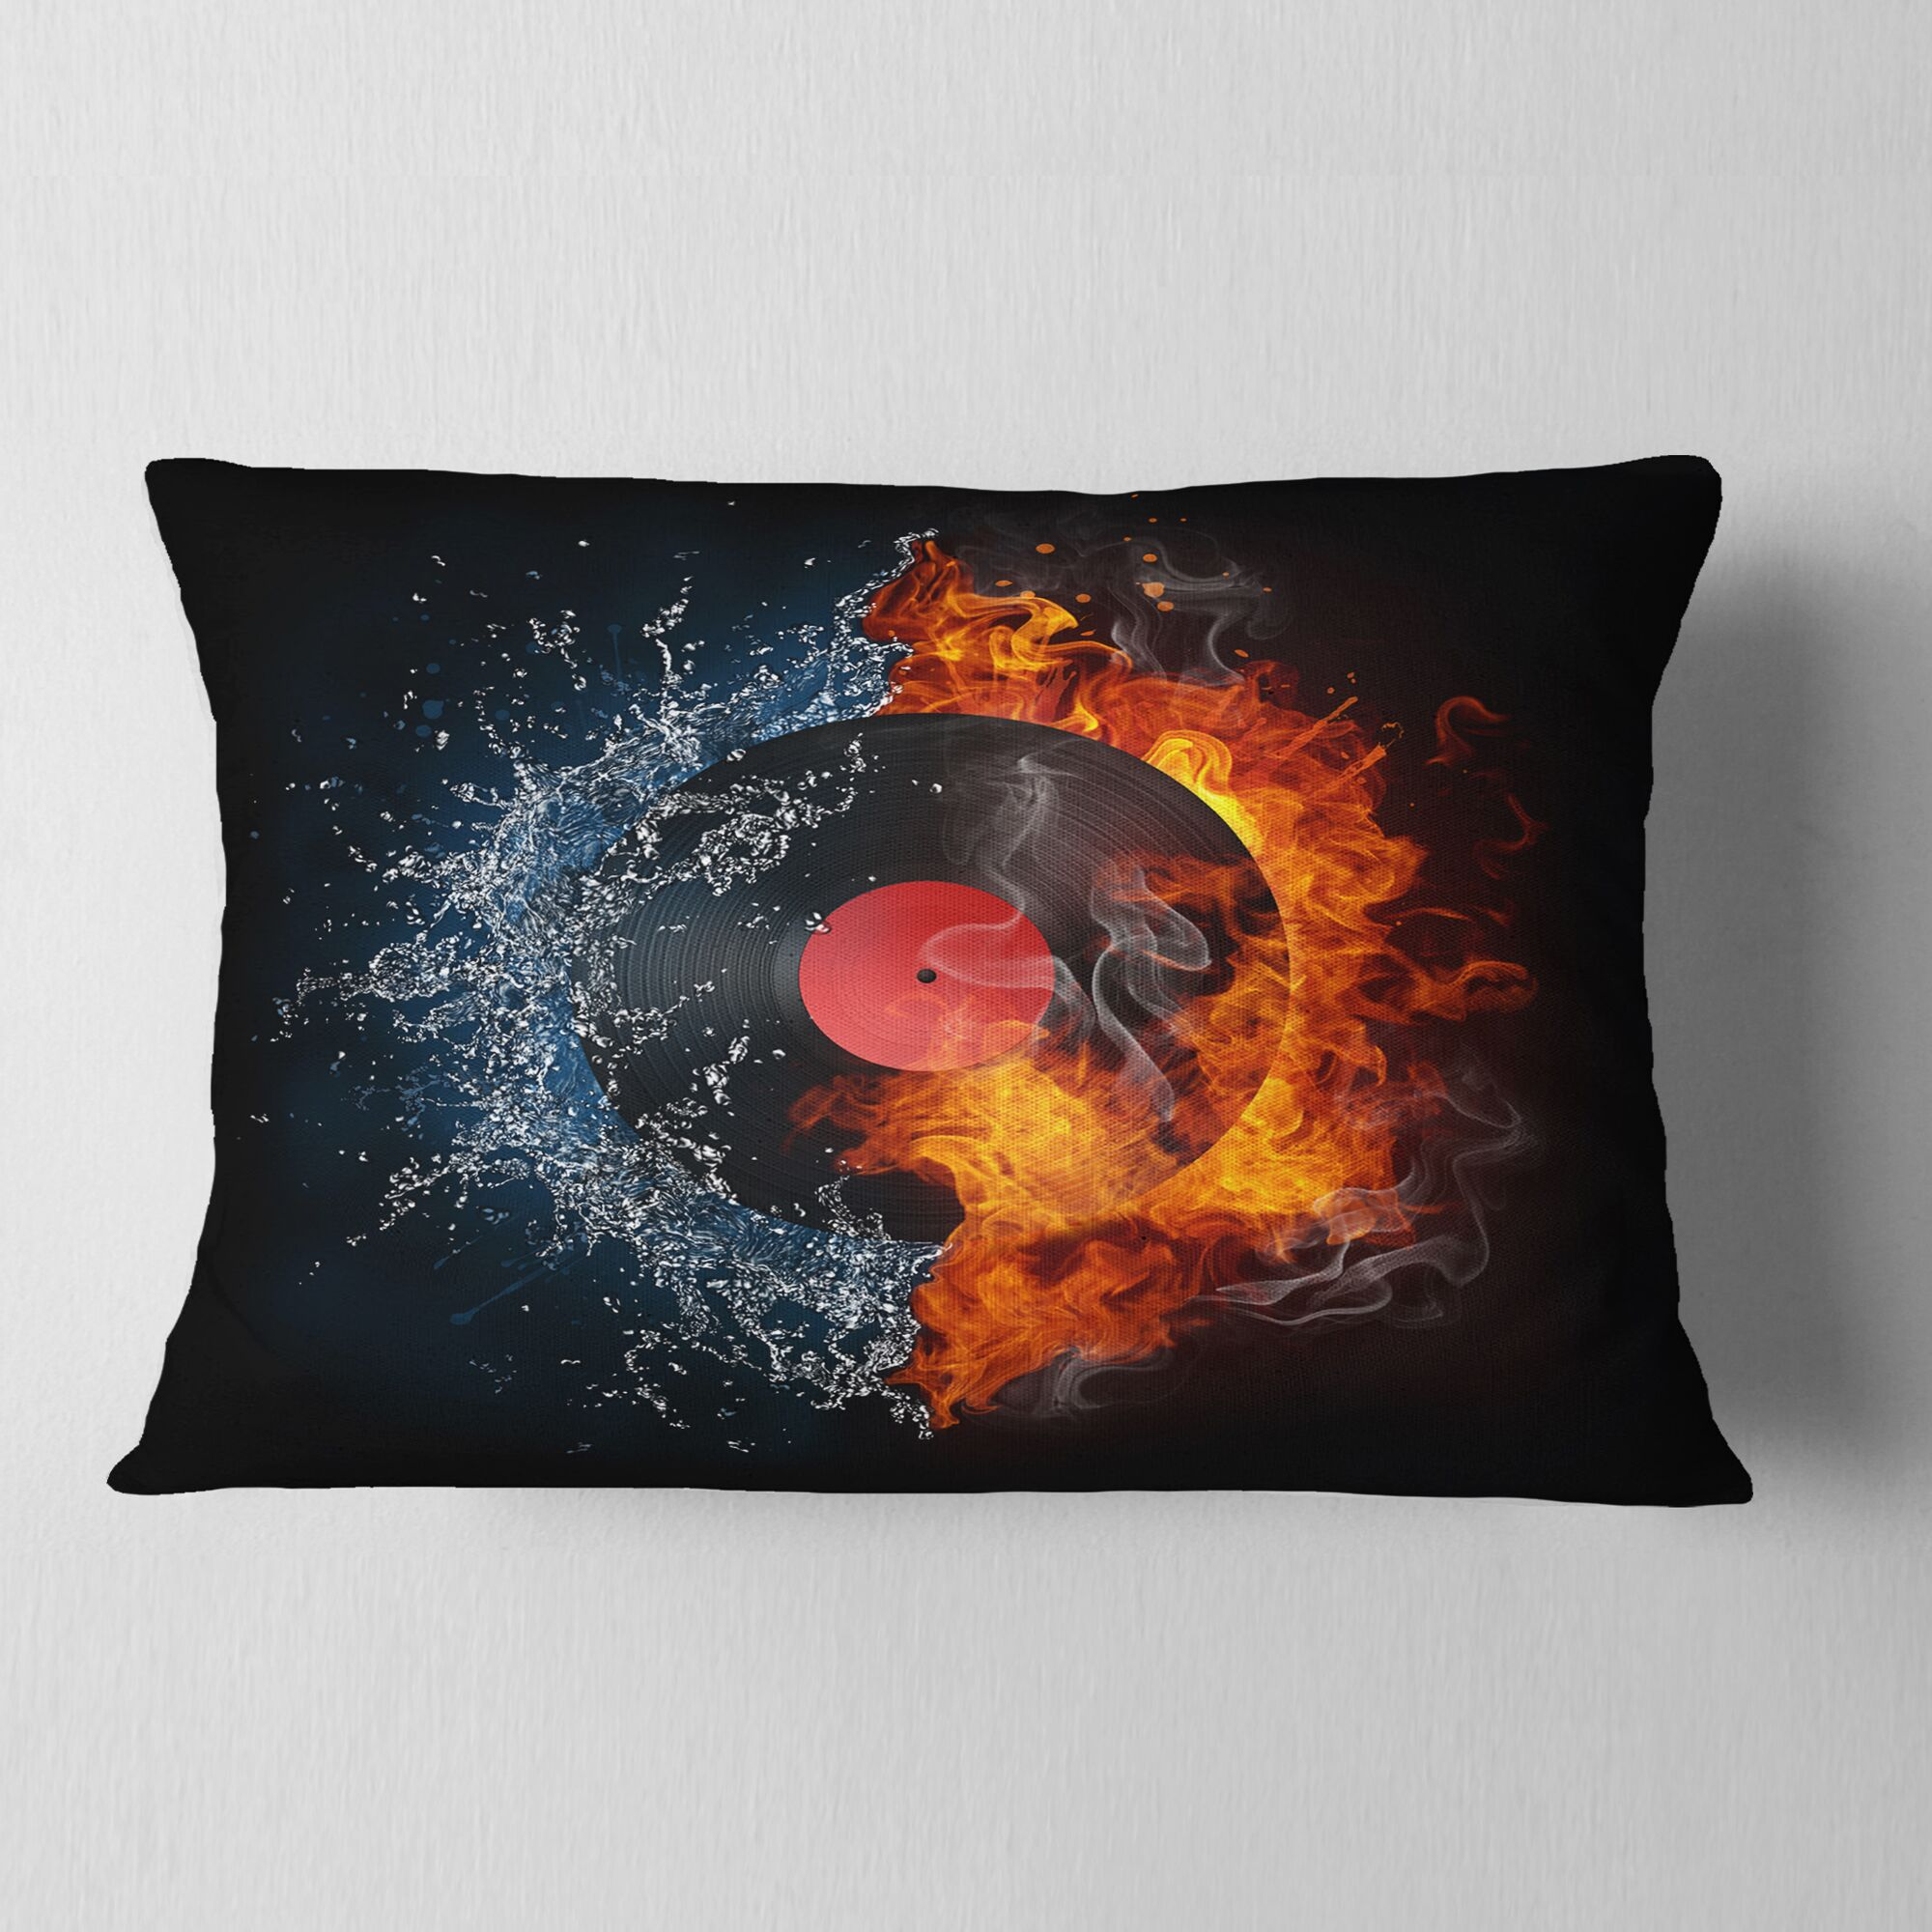 Abstract Record Abstract Lumbar Pillow